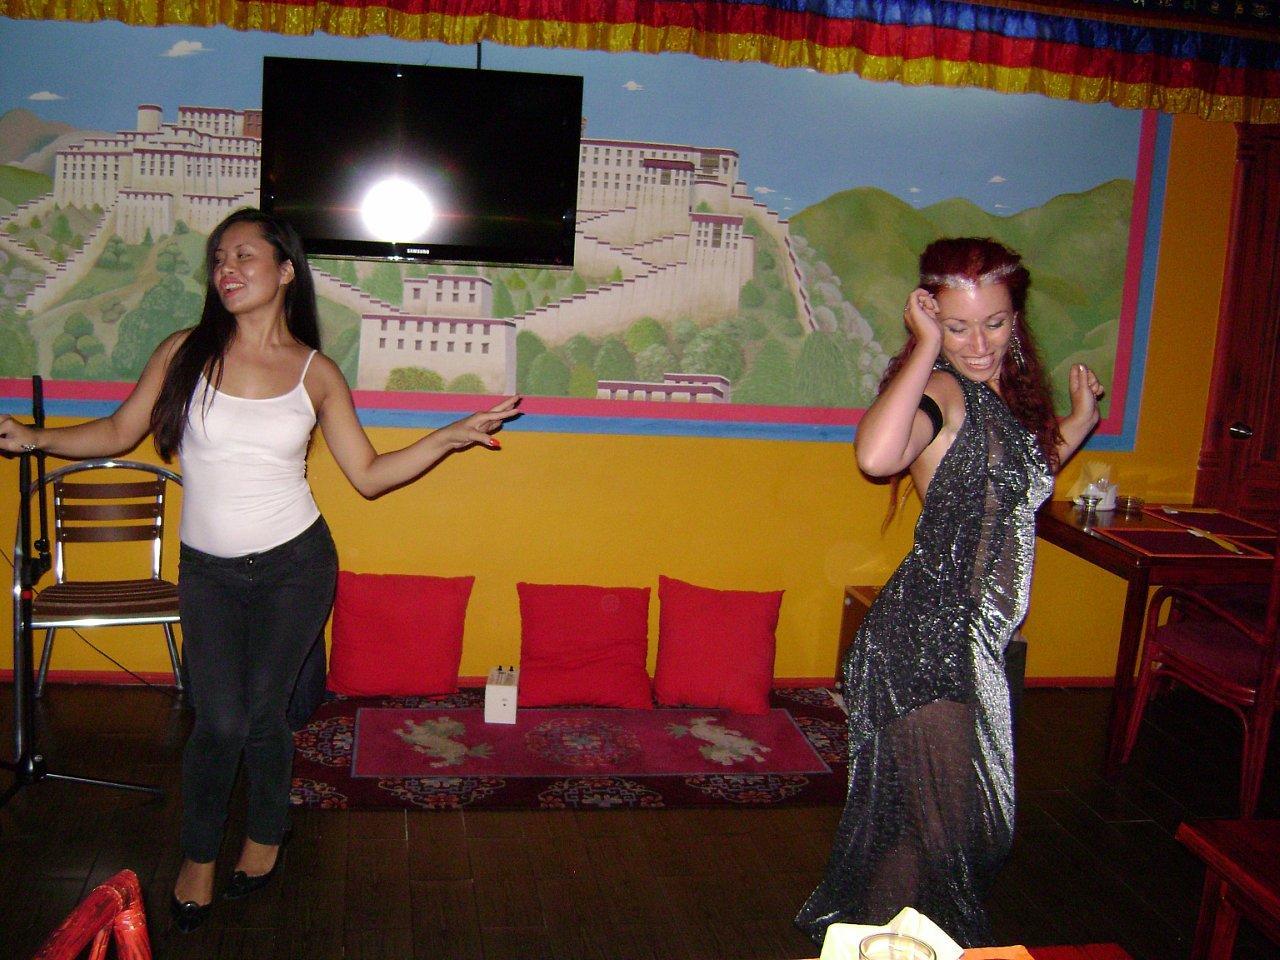 Ресторан Тибет Гималаи на Лубянке фото 49